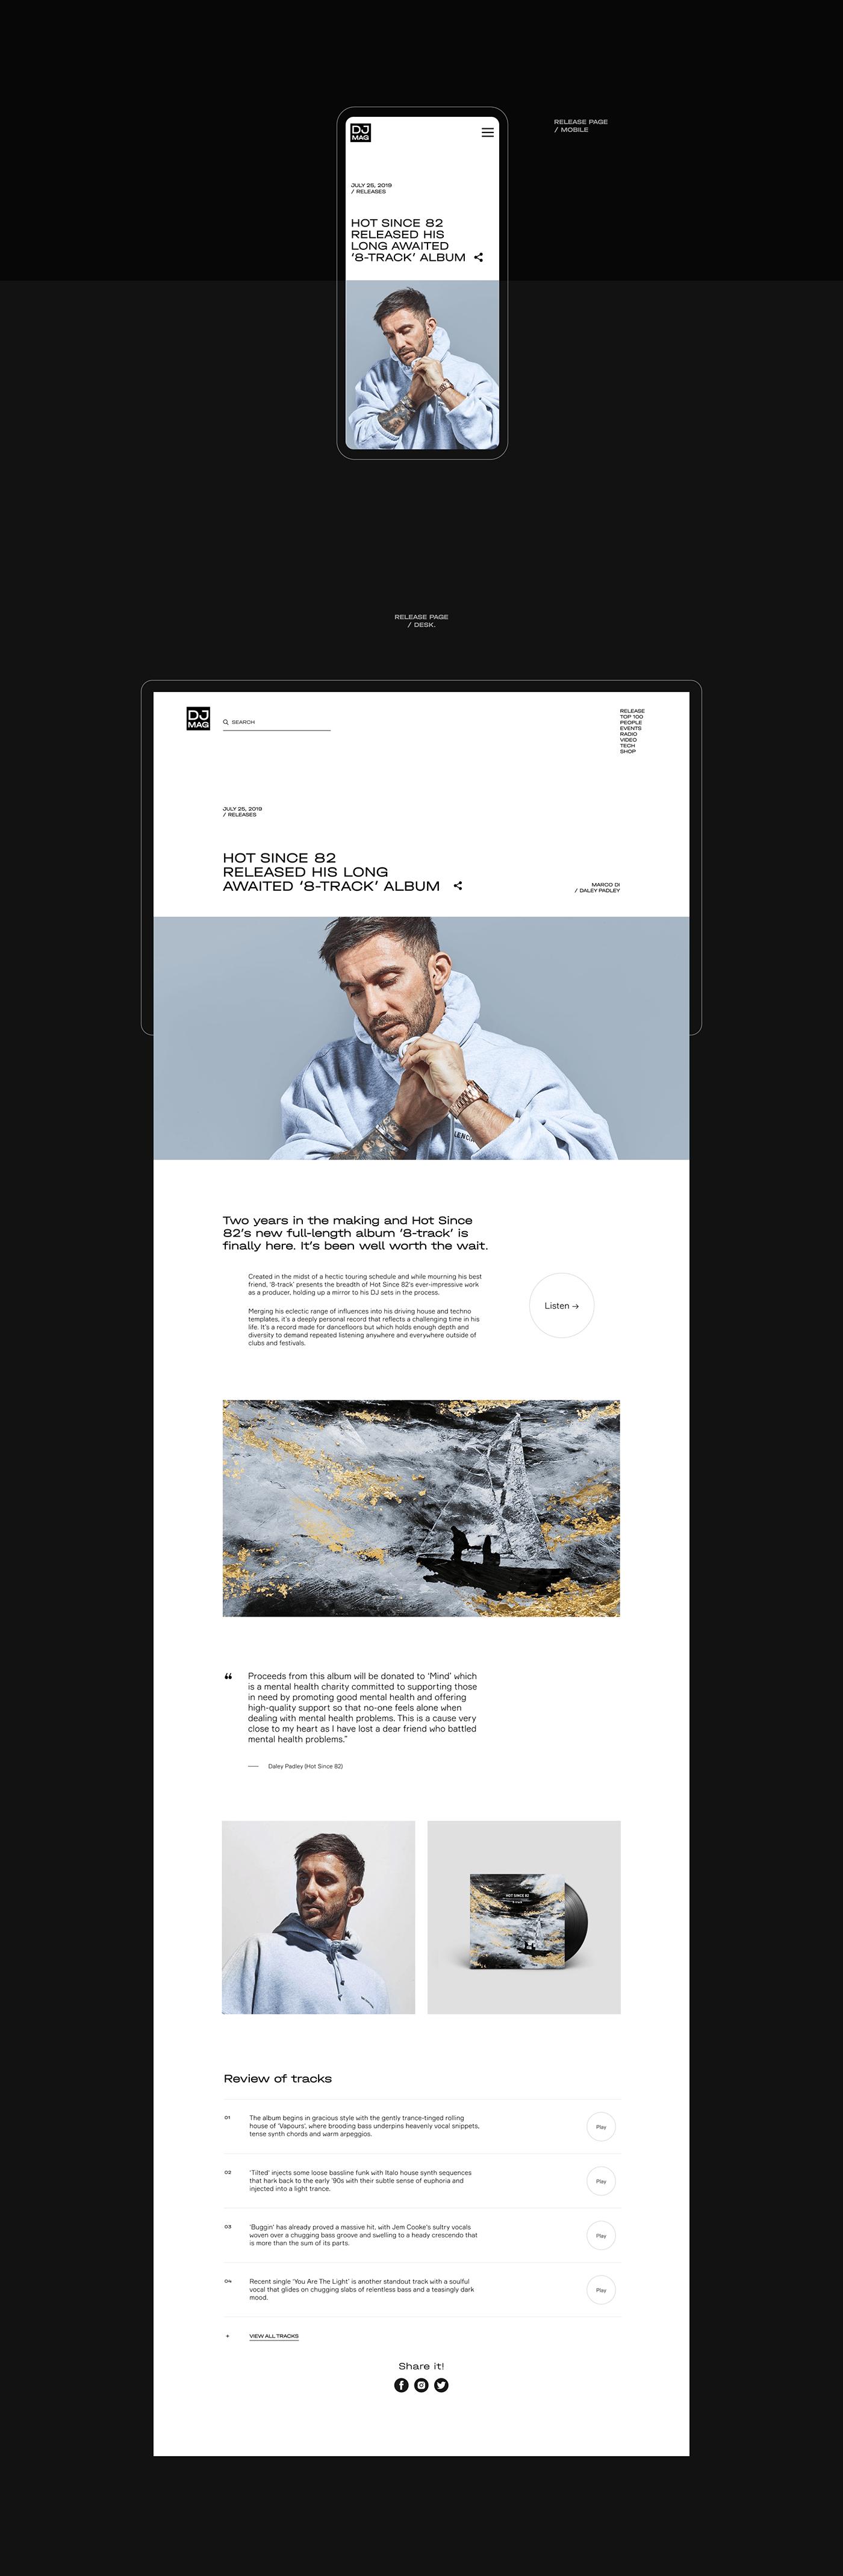 news,newspaper,music,redesign,Web Design ,UI,ux,articles,Web,mobile